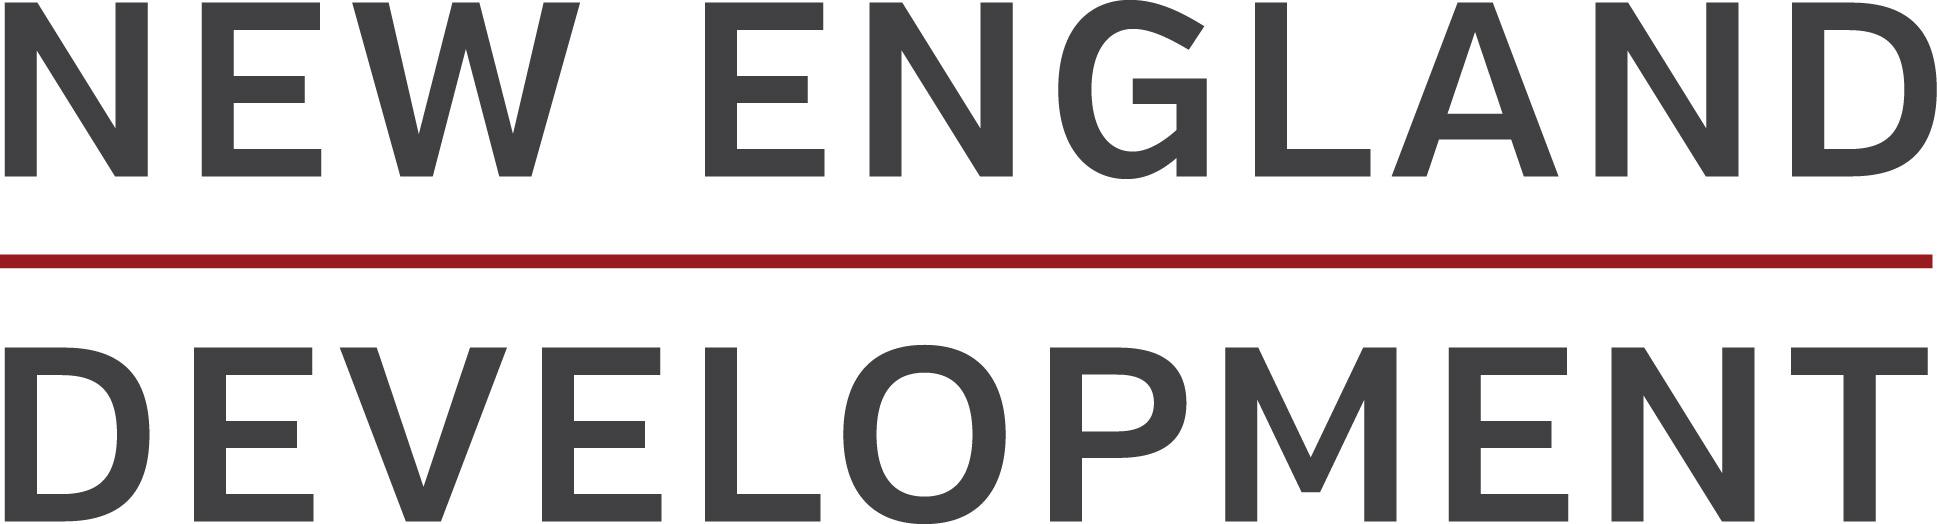 New England Development identifier